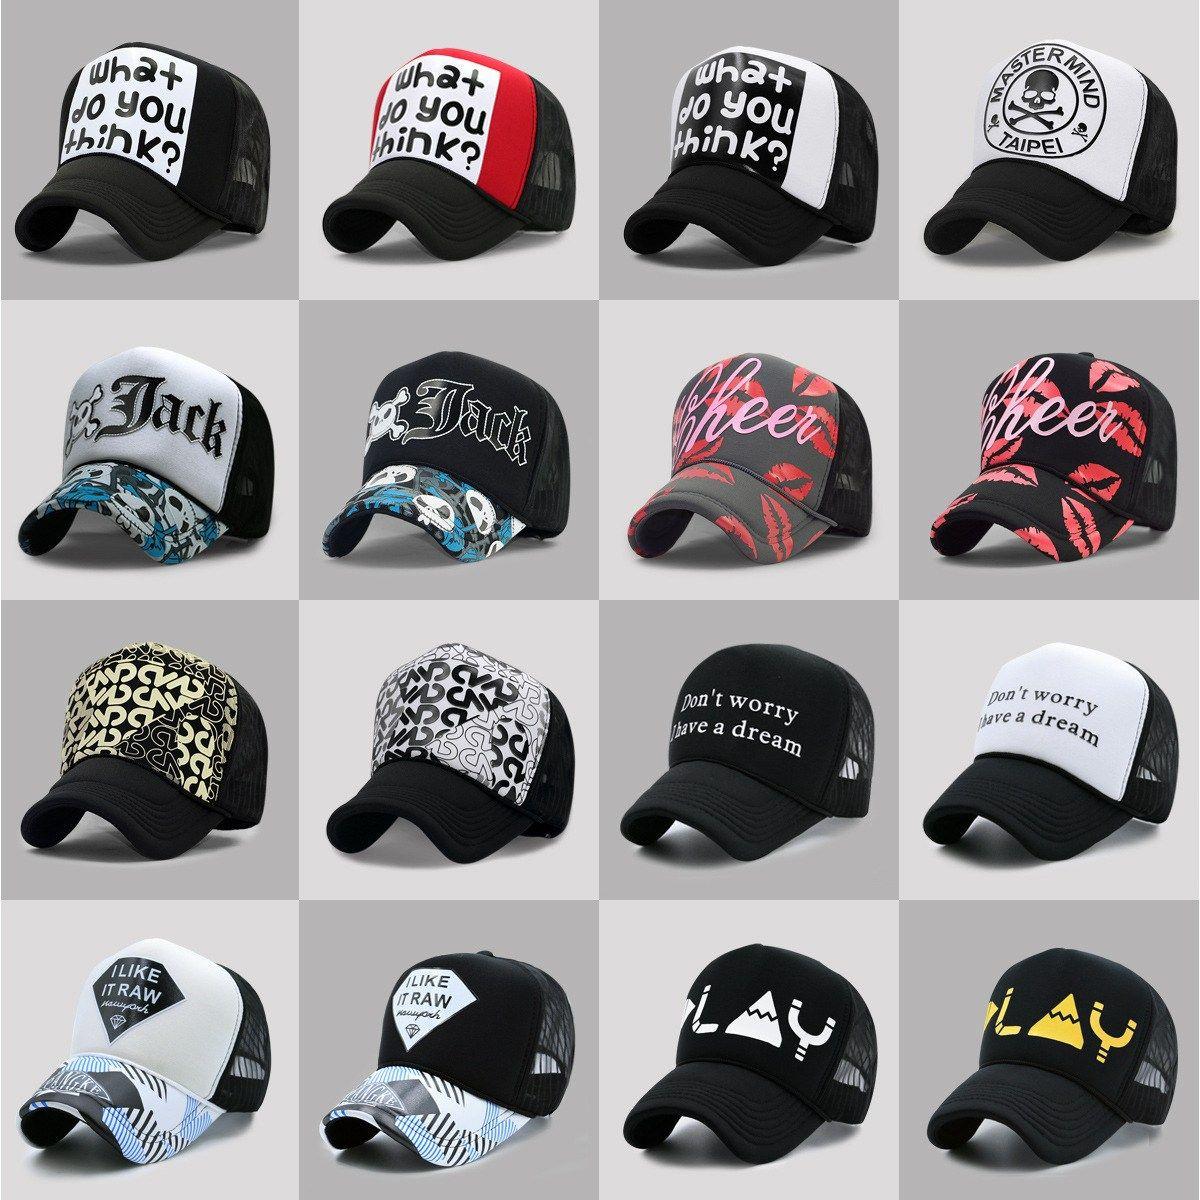 35741056c68 20 Colors Adult Summer Mesh Trucker Caps Men Hiphop Punk Rock Snapback Hat  Women Curved Baseball Cap – Bestsellers